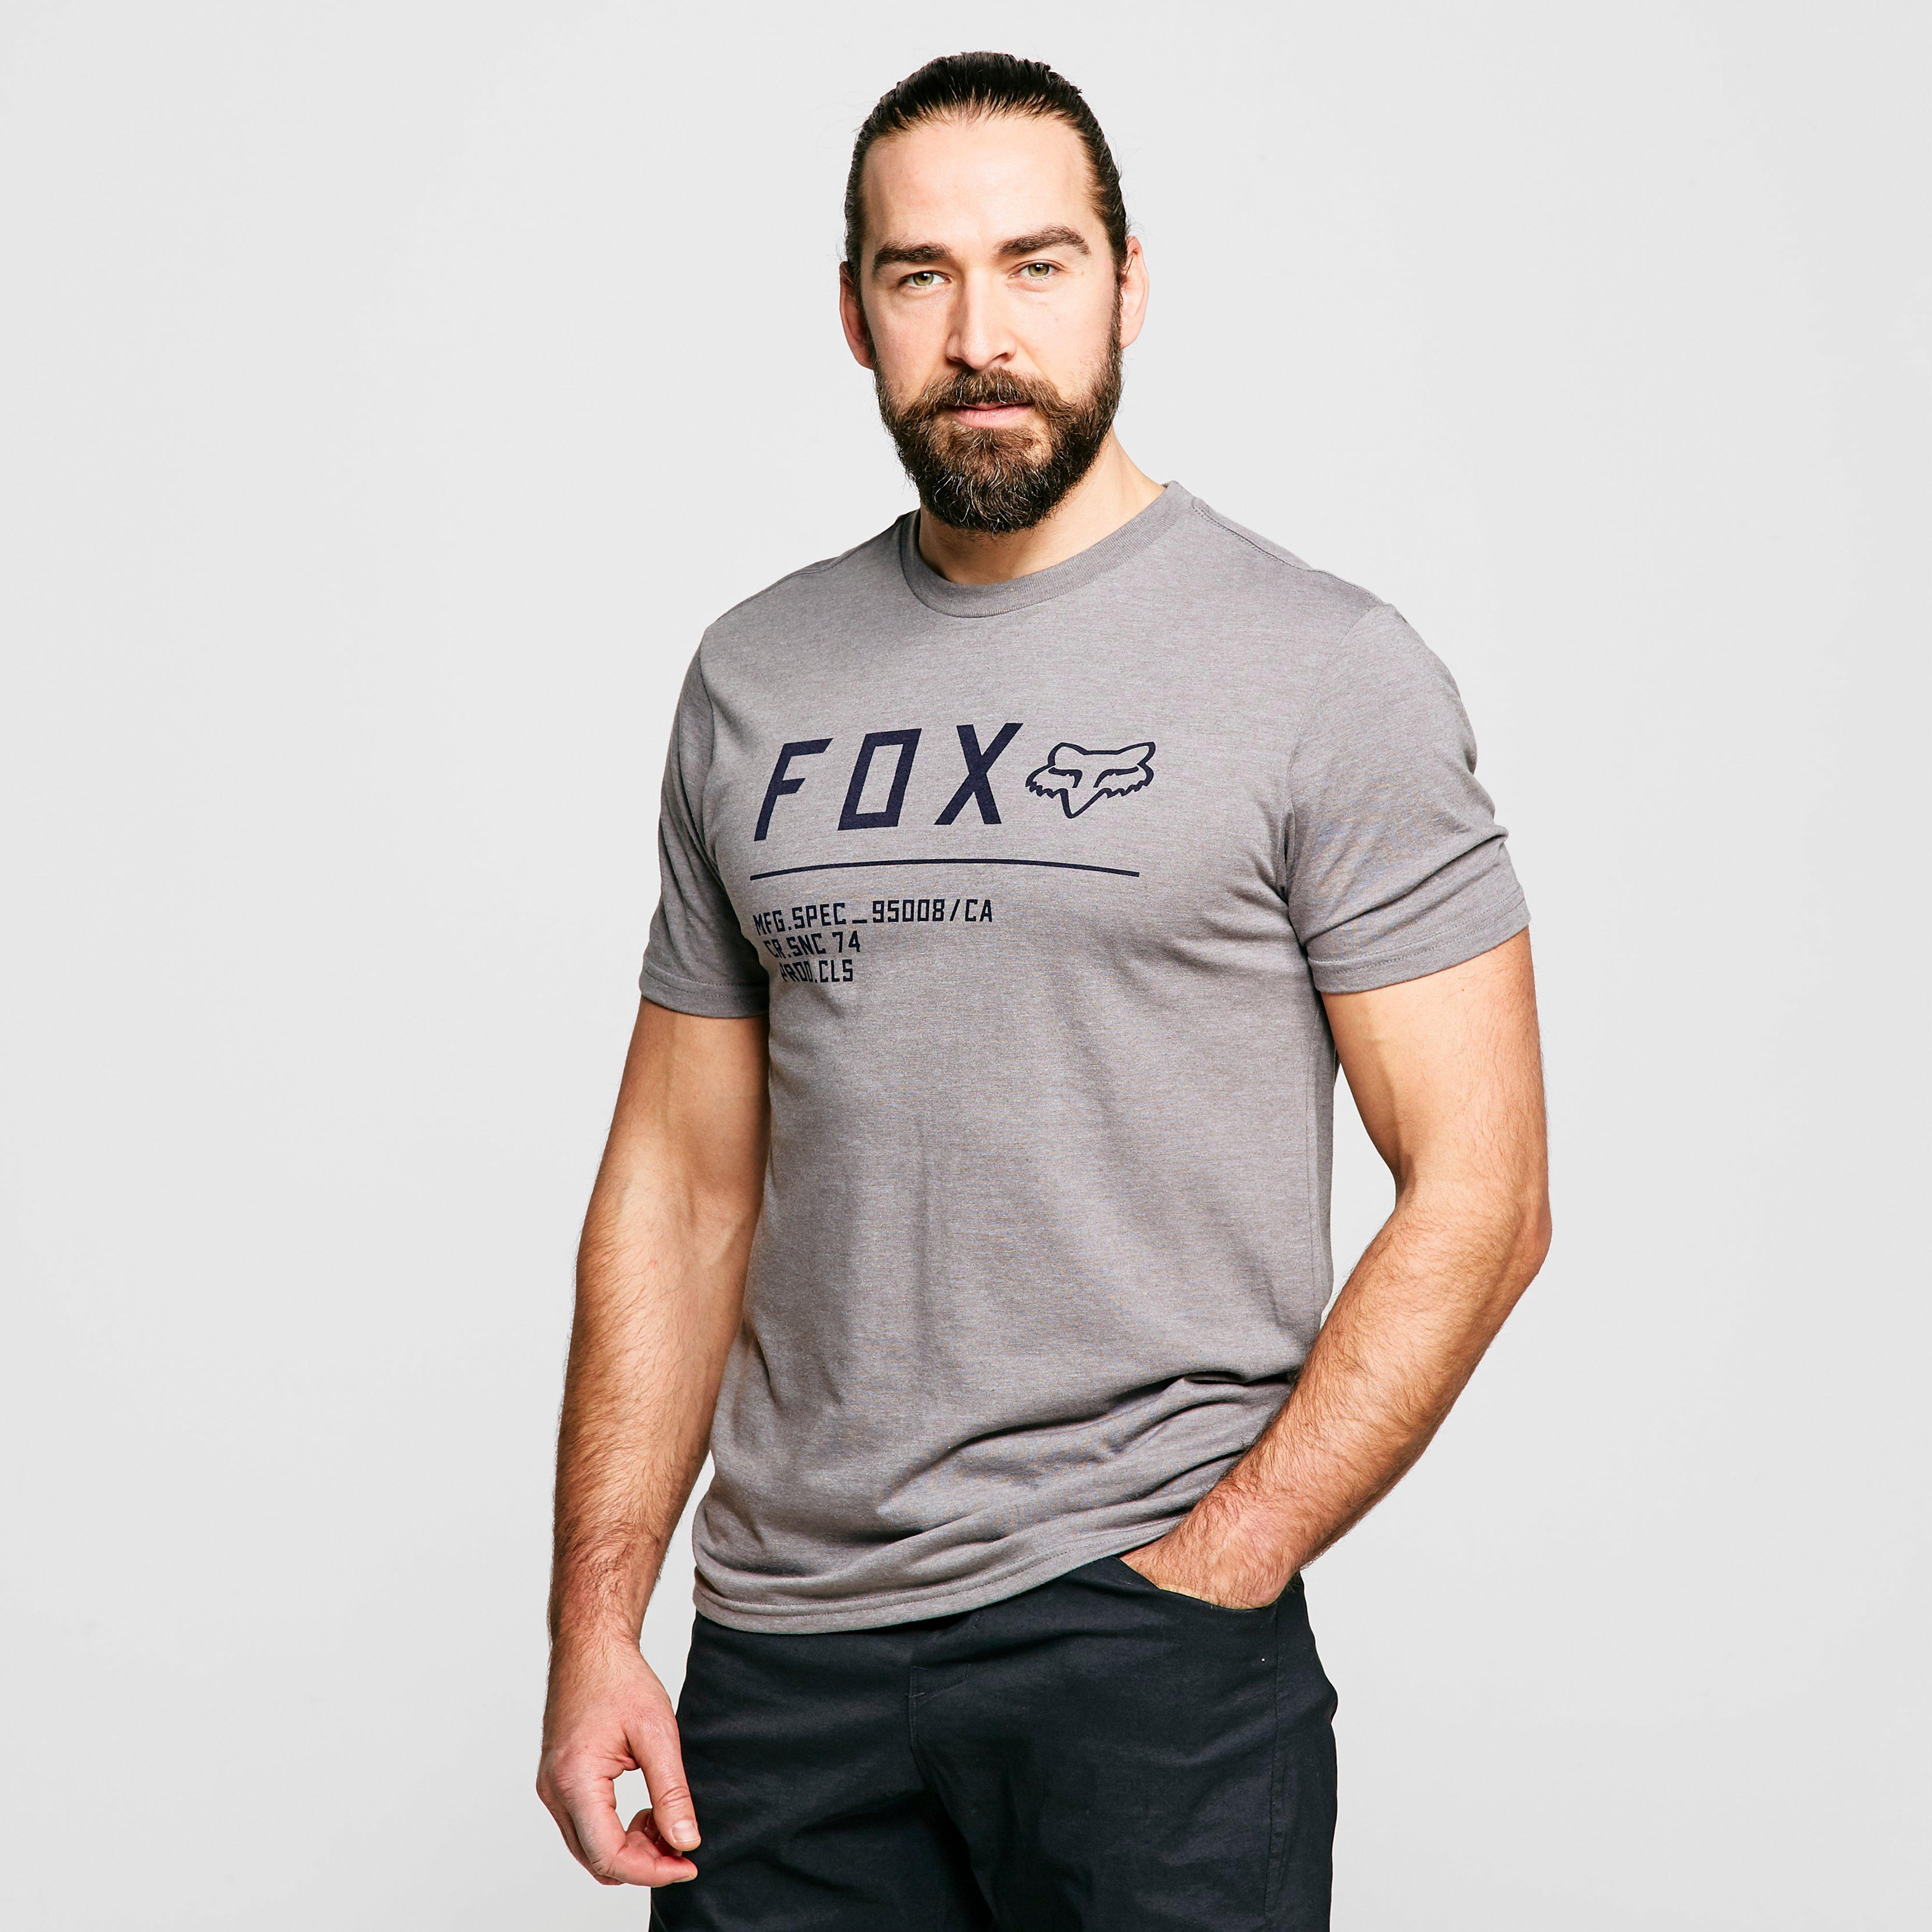 FOX Fox Non Stop Short Sleeve Premium Tee, Grey